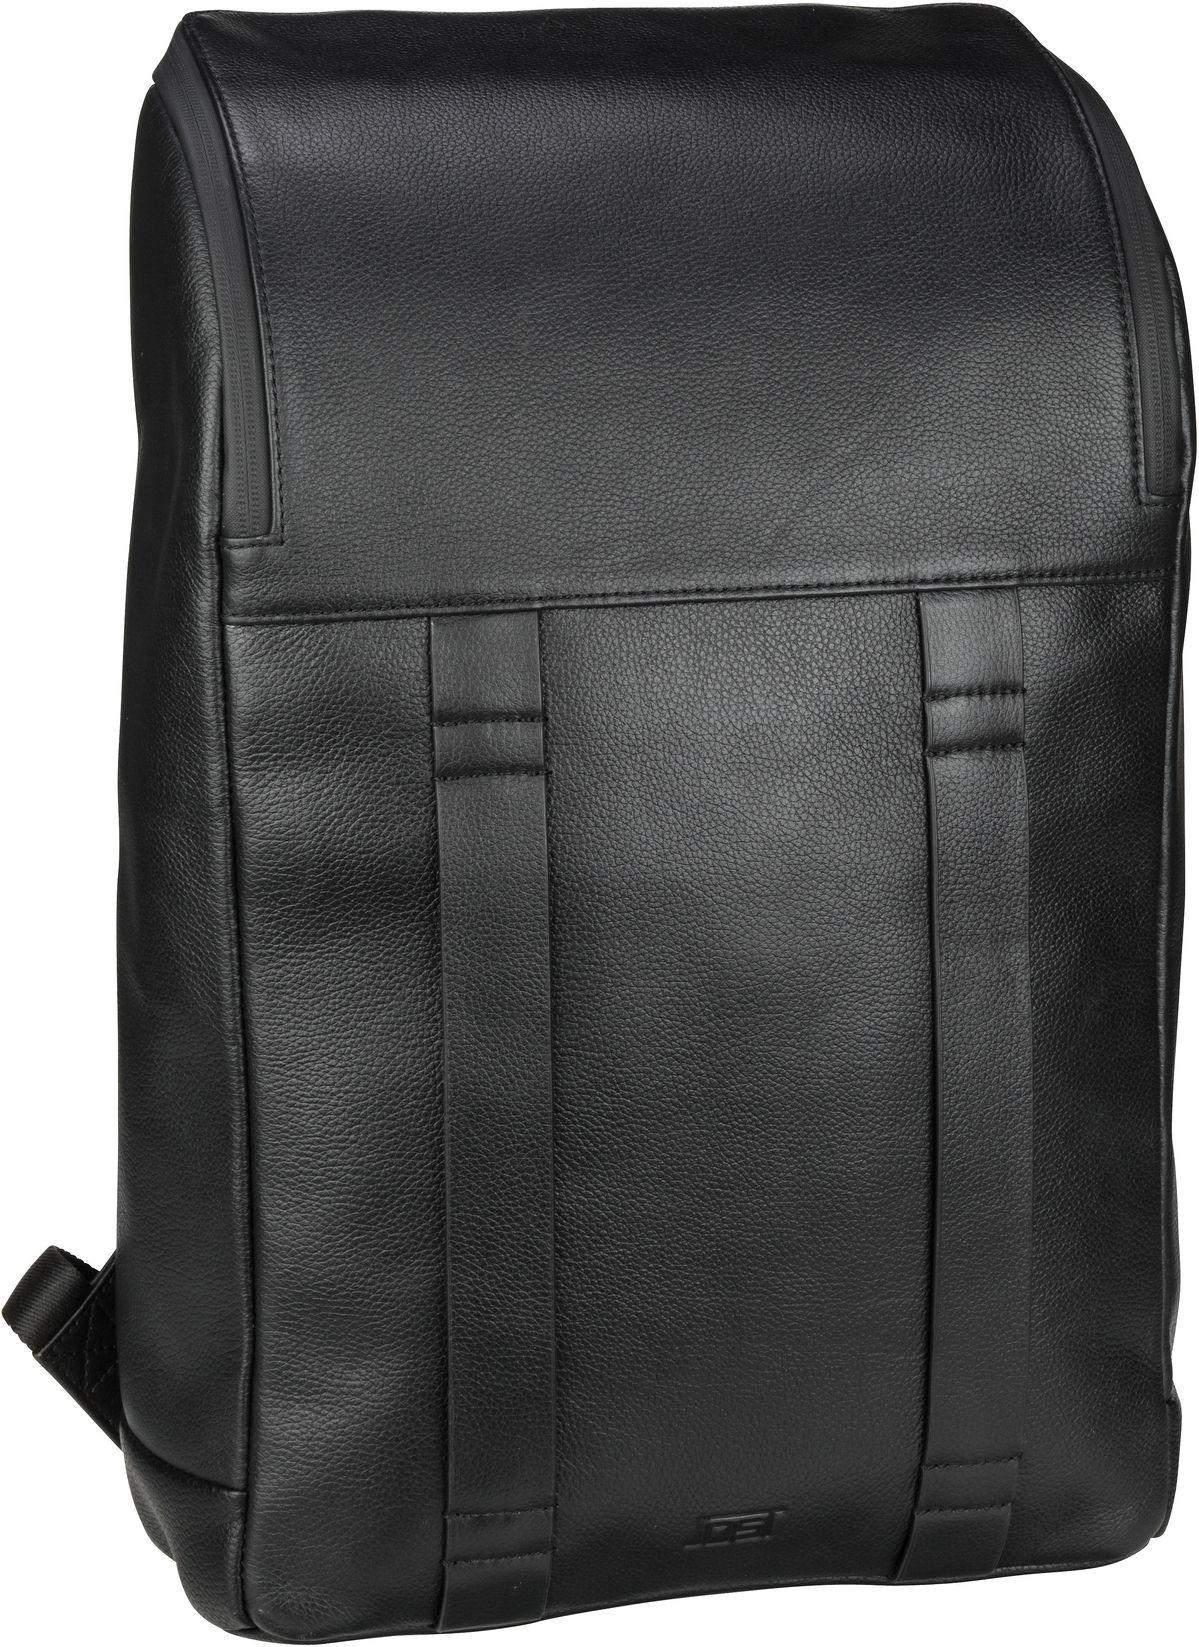 Laptoprucksack Reykjavik 4004 Daypack Black